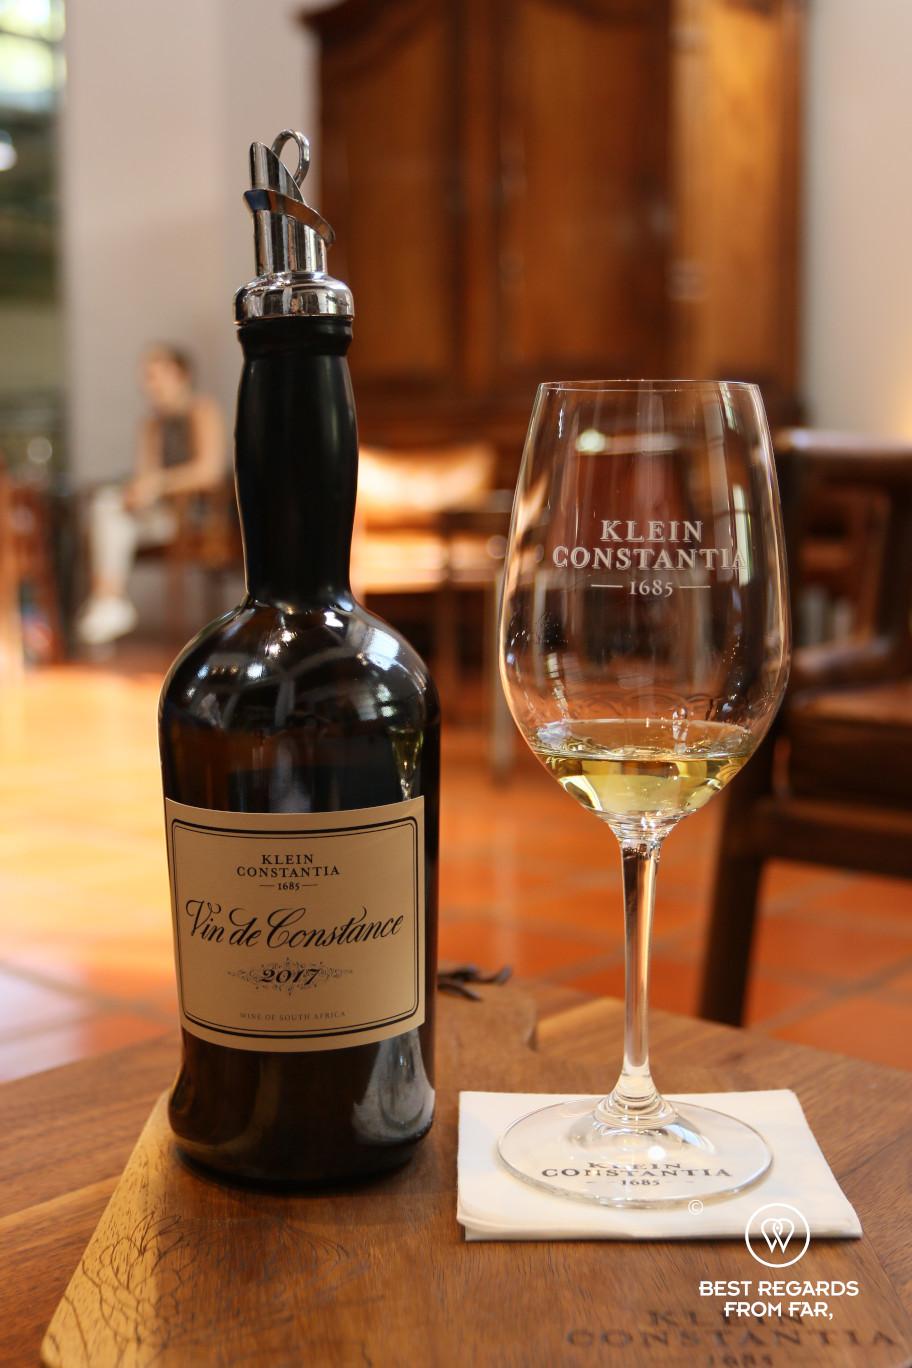 Vin de Constance wine tasting in Klein Constantia, Constantia wine route, Cape Town